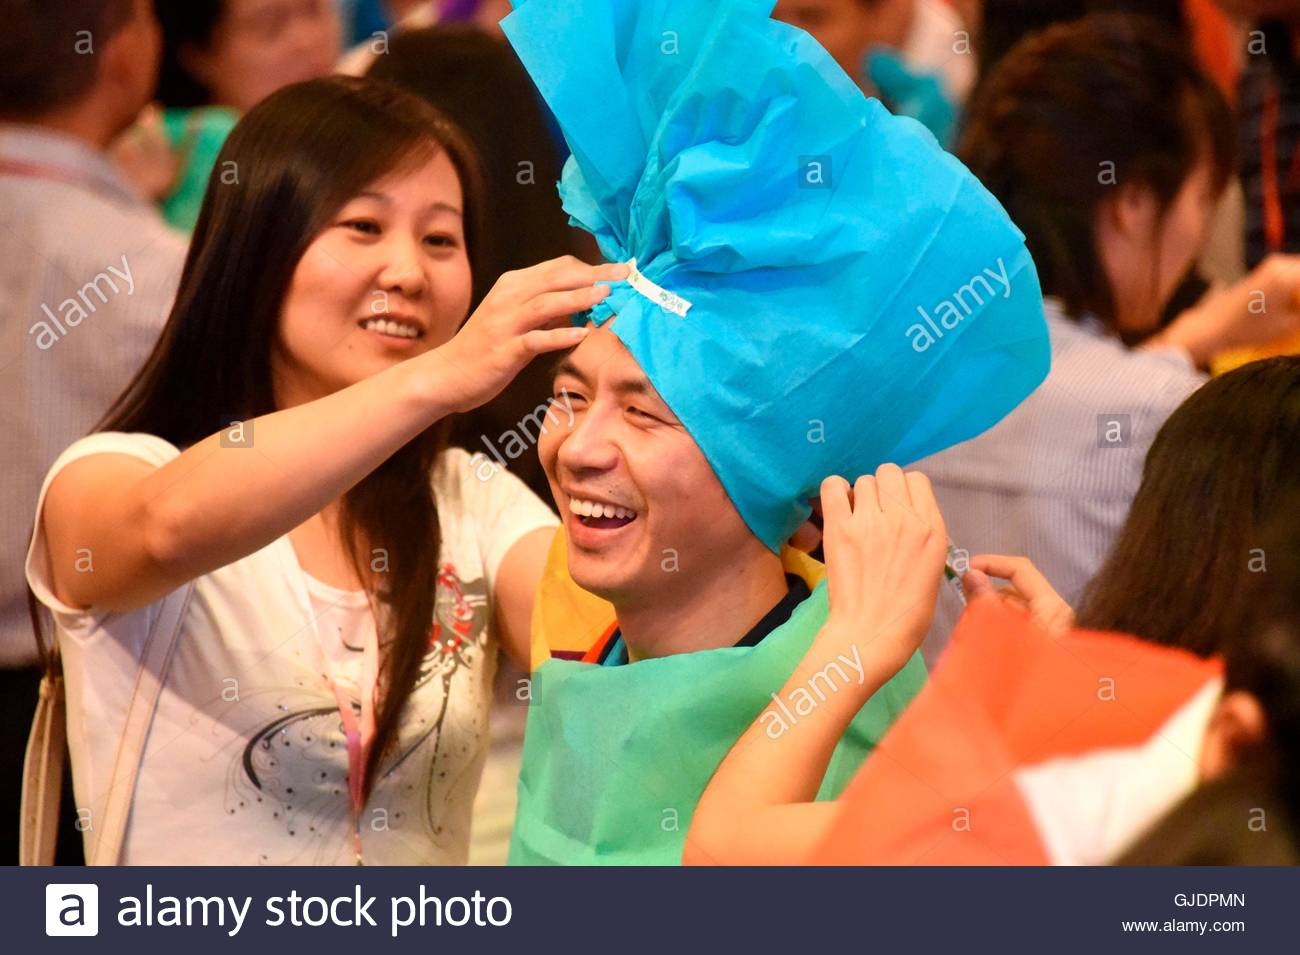 Dating Shenzhen China